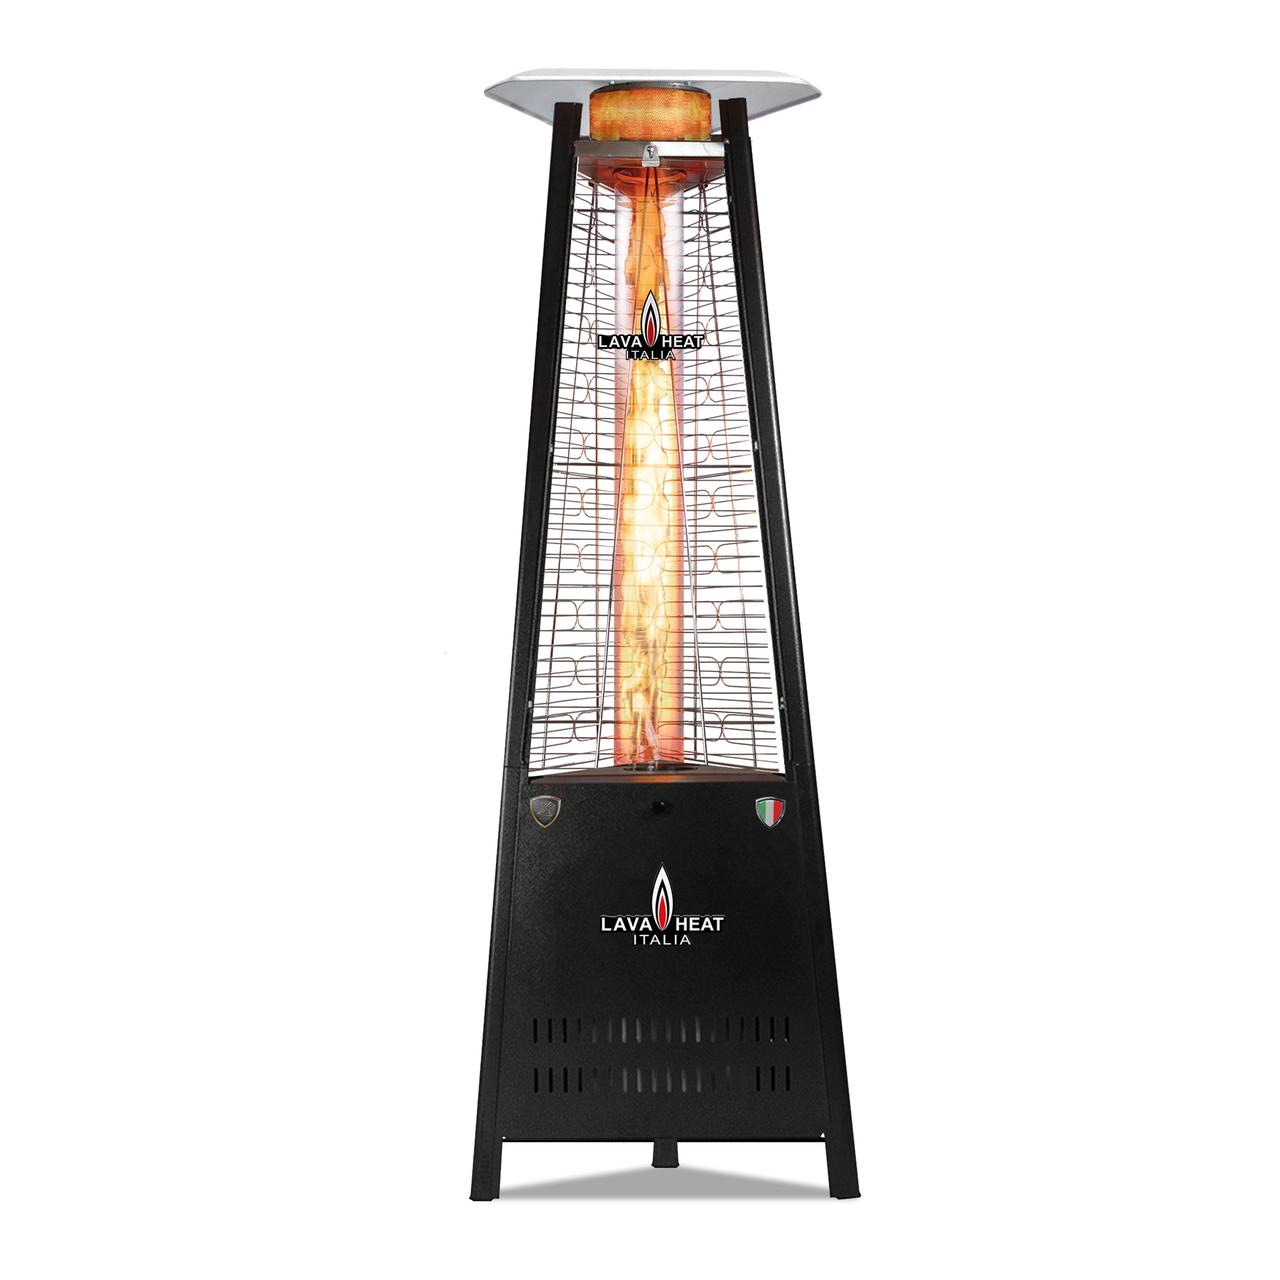 Lava Heat LP Capri KD Triangle Flame Tower Heater - Hammered Black